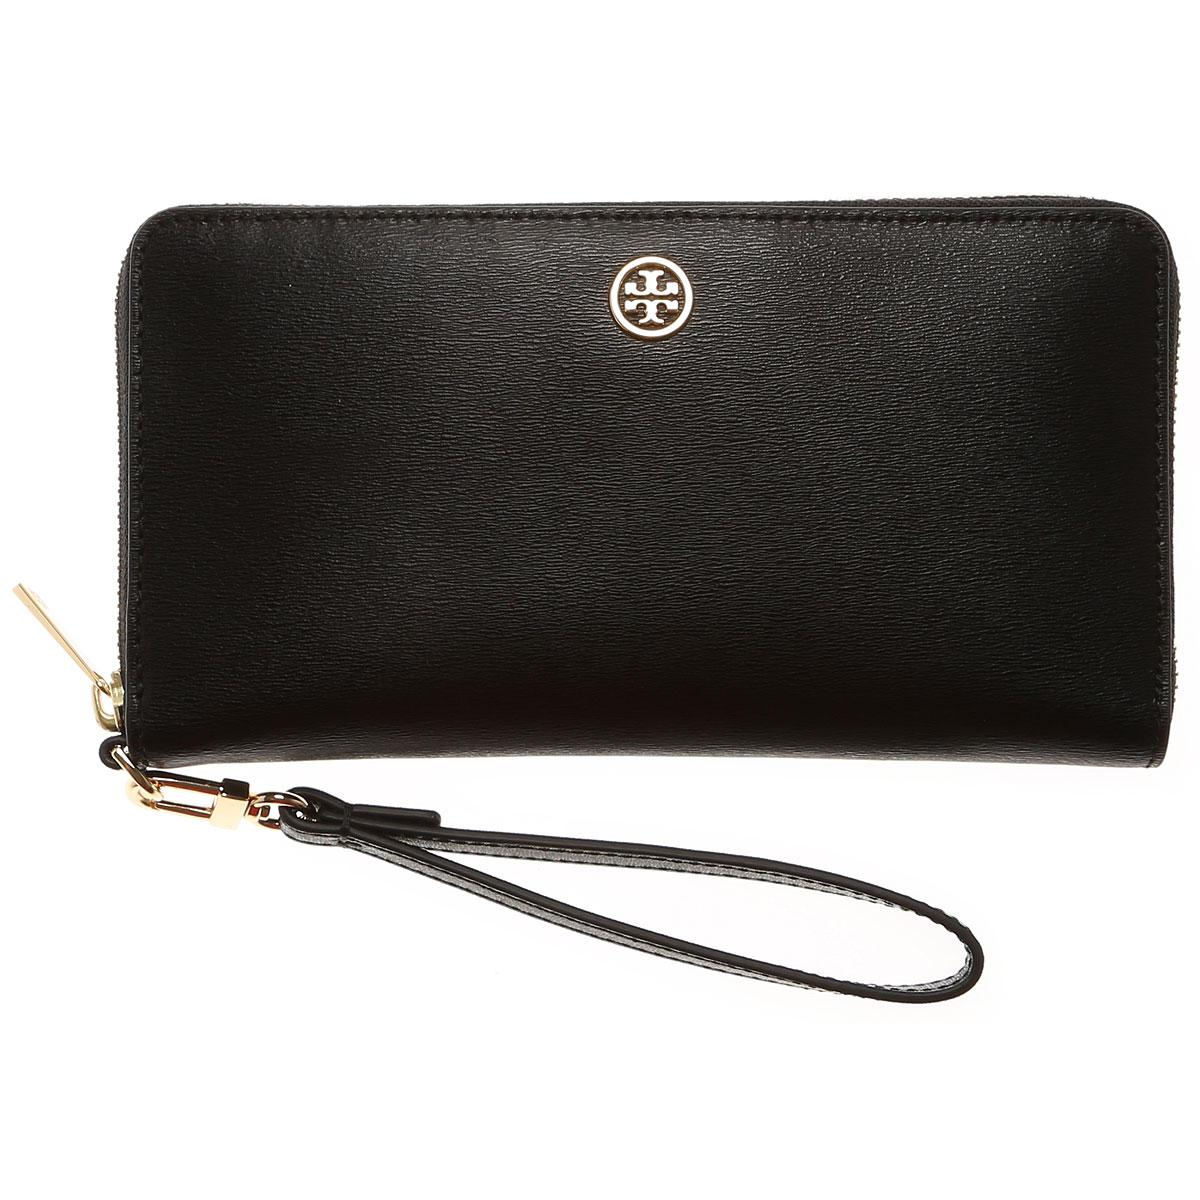 Lyst - Tory Burch Wallet For Women On Sale in Black 109a604a63